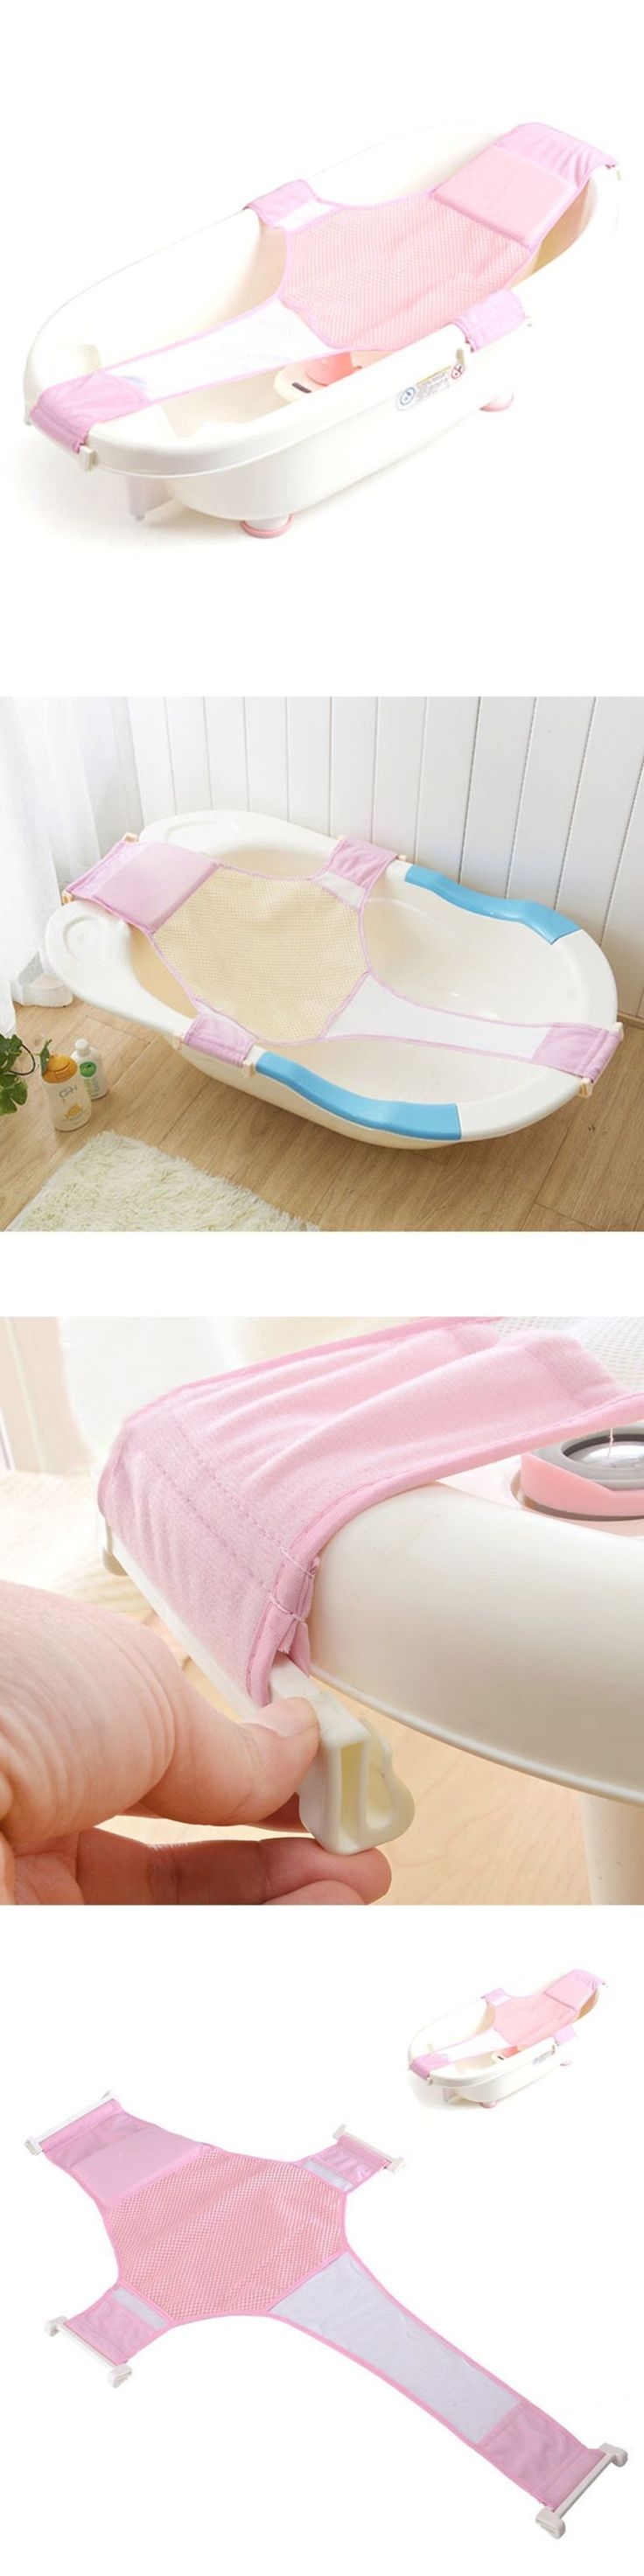 Bath Tub Seats and Rings 162024: Byp Baby Newborn Bath Seat Support Net Non-Slip Bathtub Sling Shower Mesh Bathin -> BUY IT NOW ONLY: $37.64 on eBay!